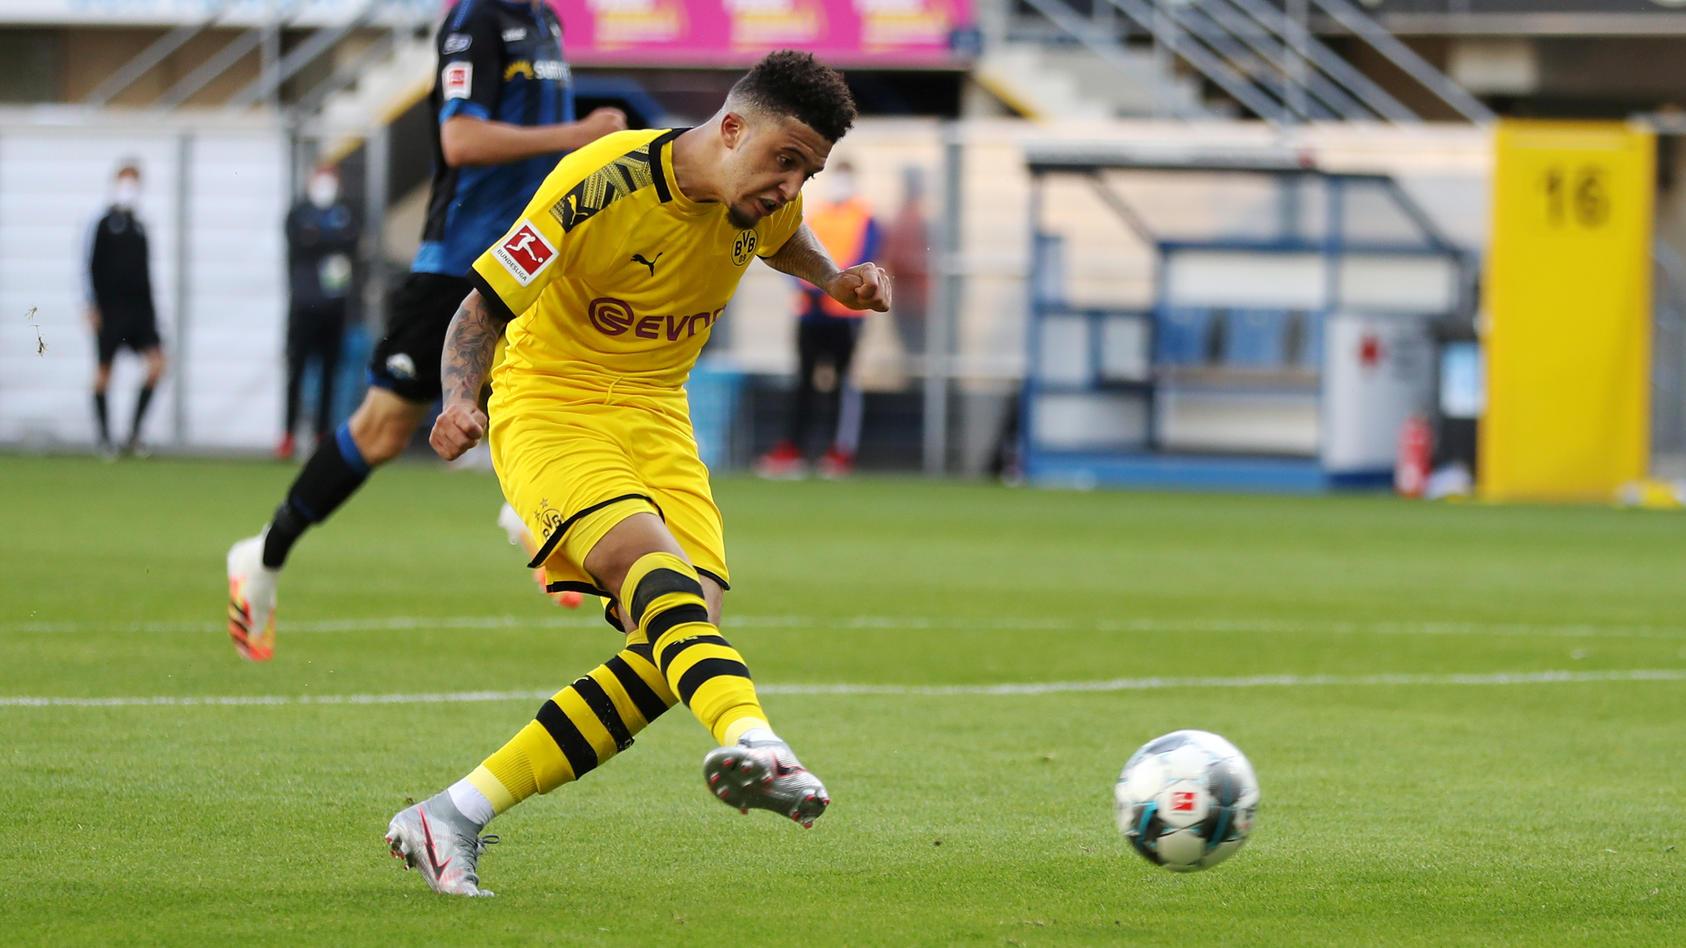 Bundesliga - SC Paderborn v Borussia Dortmund